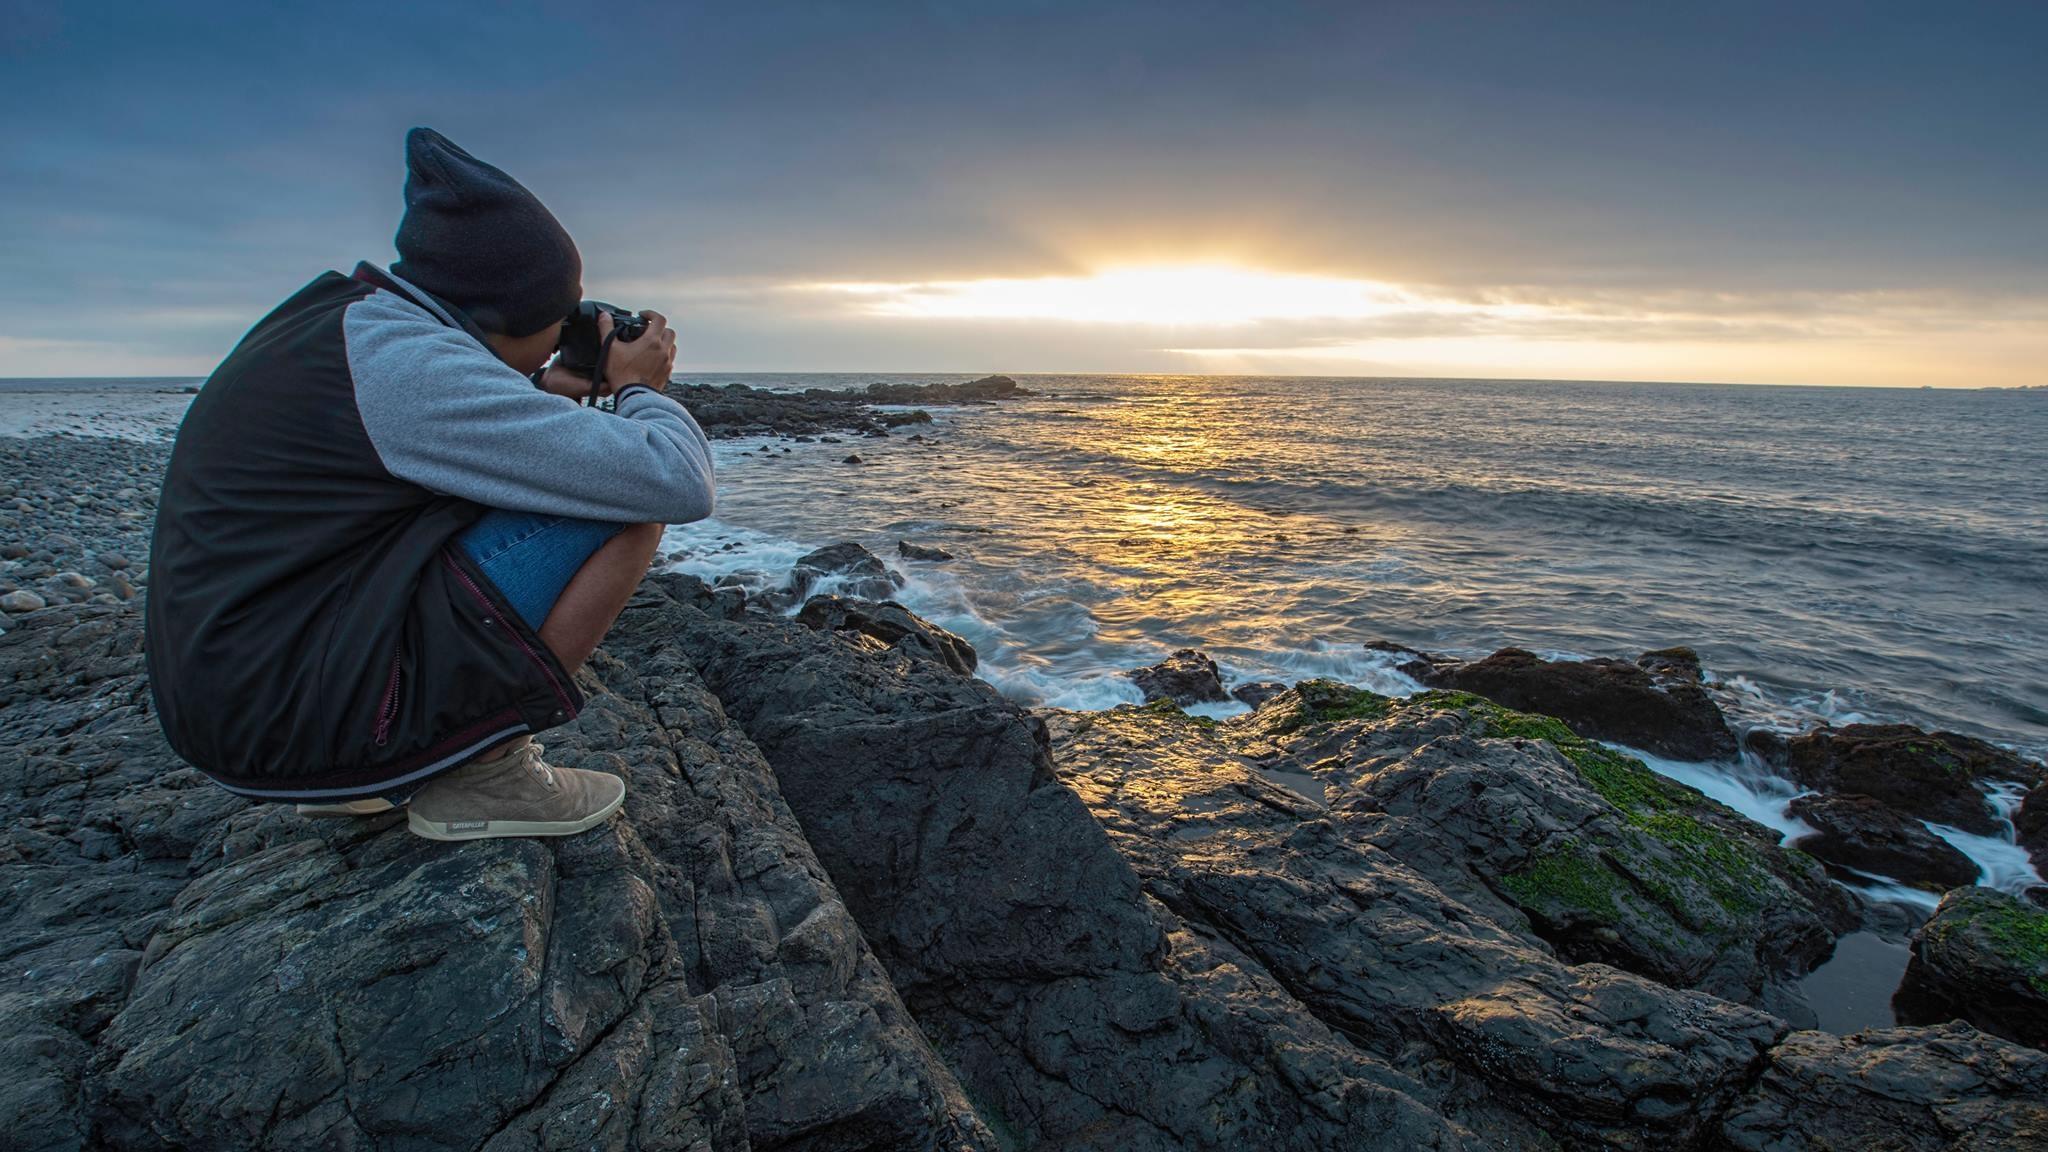 Love the photography by Denzen Iosam Jofre Elal